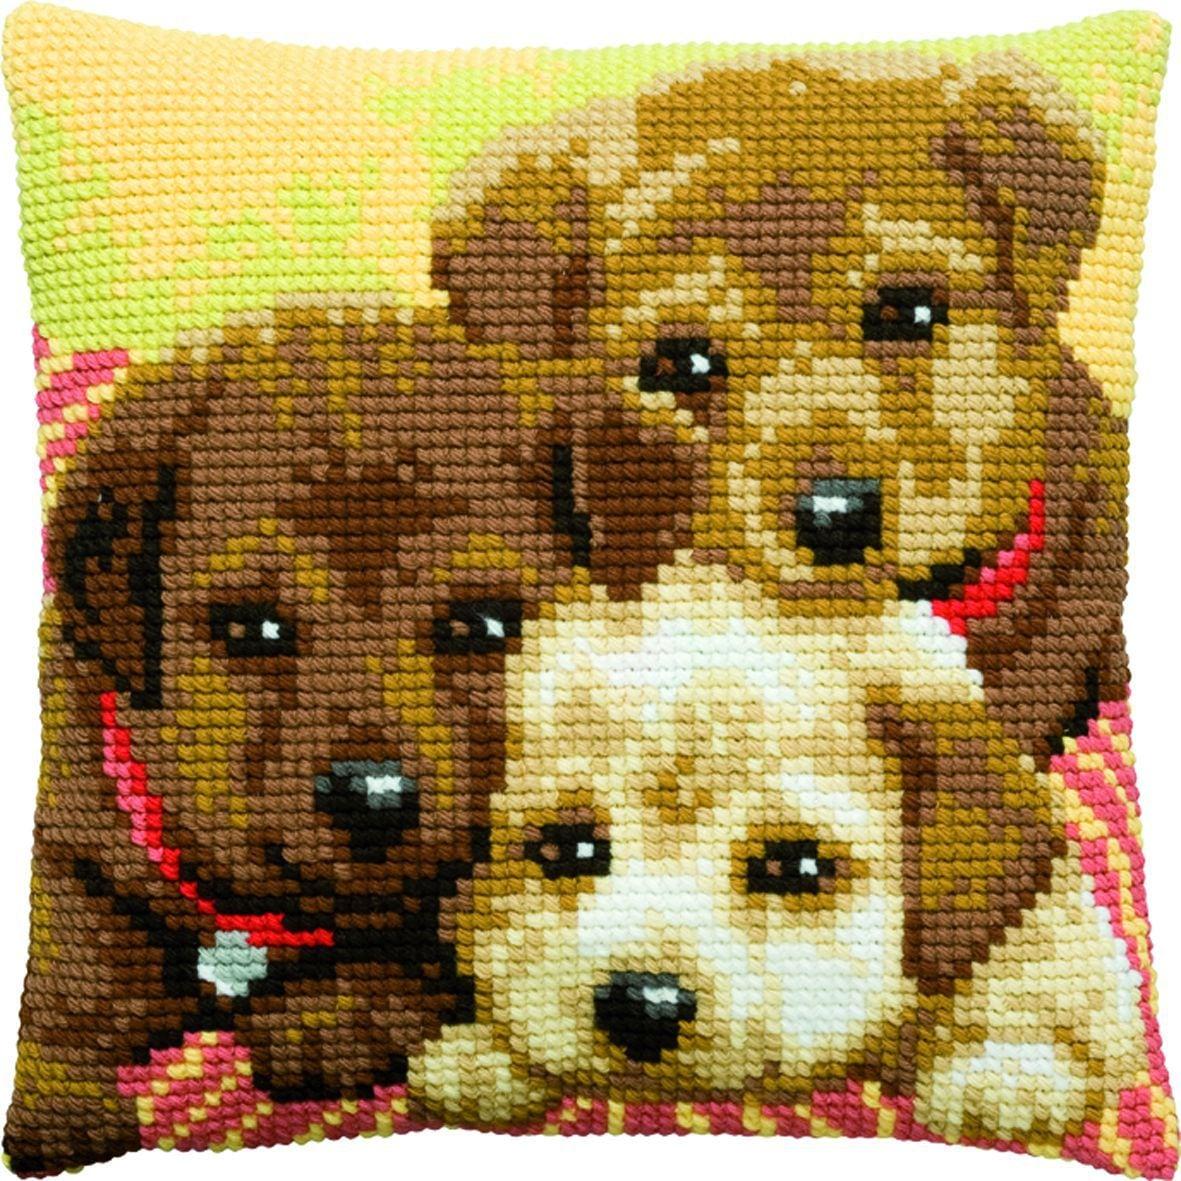 cross stitch cushion three puppies printed